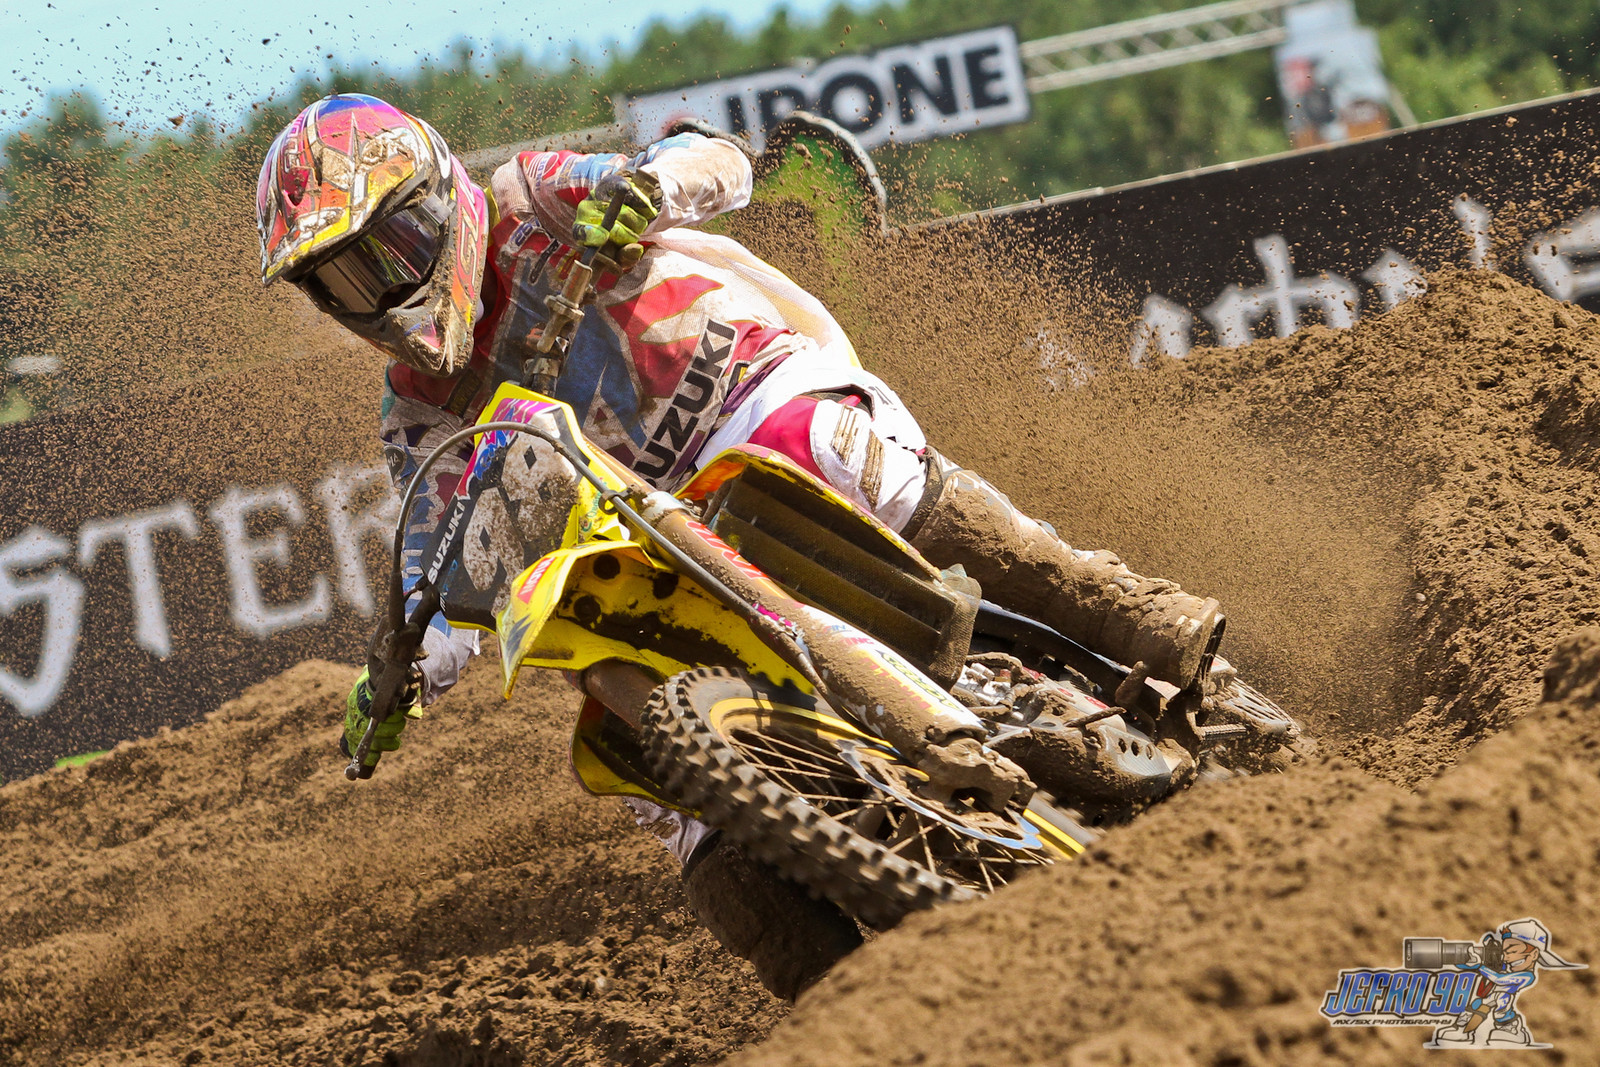 Bas Vaessen - Photo Gallery: MXGP of Limburg - Motocross Pictures - Vital MX